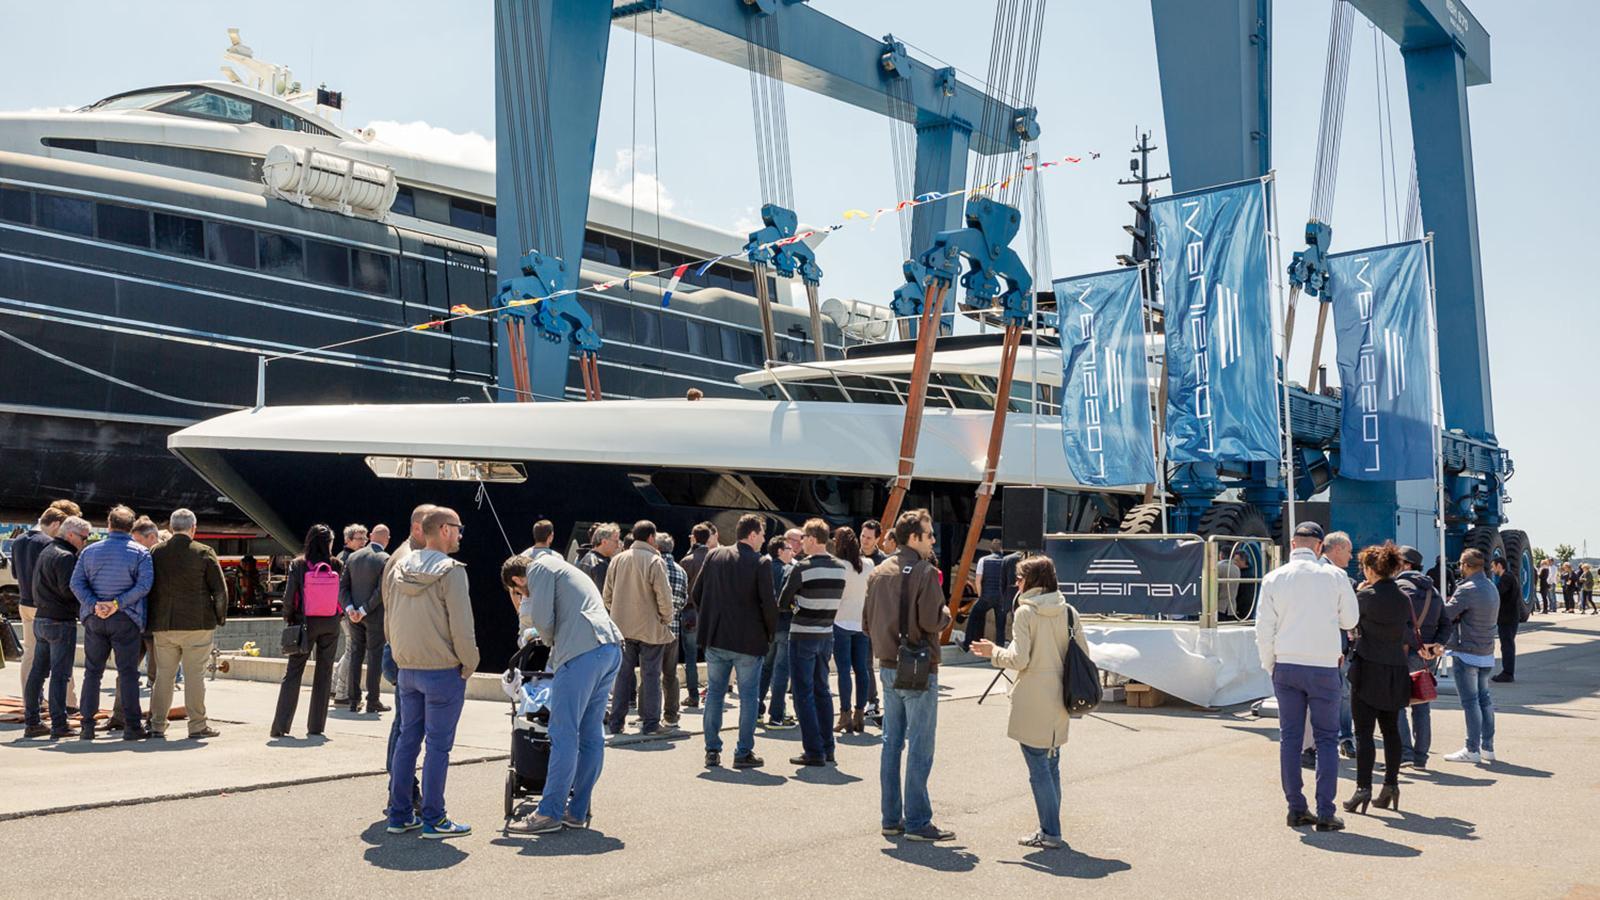 n2h motoryacht rossinavi prince shark 49m 2017 launch party